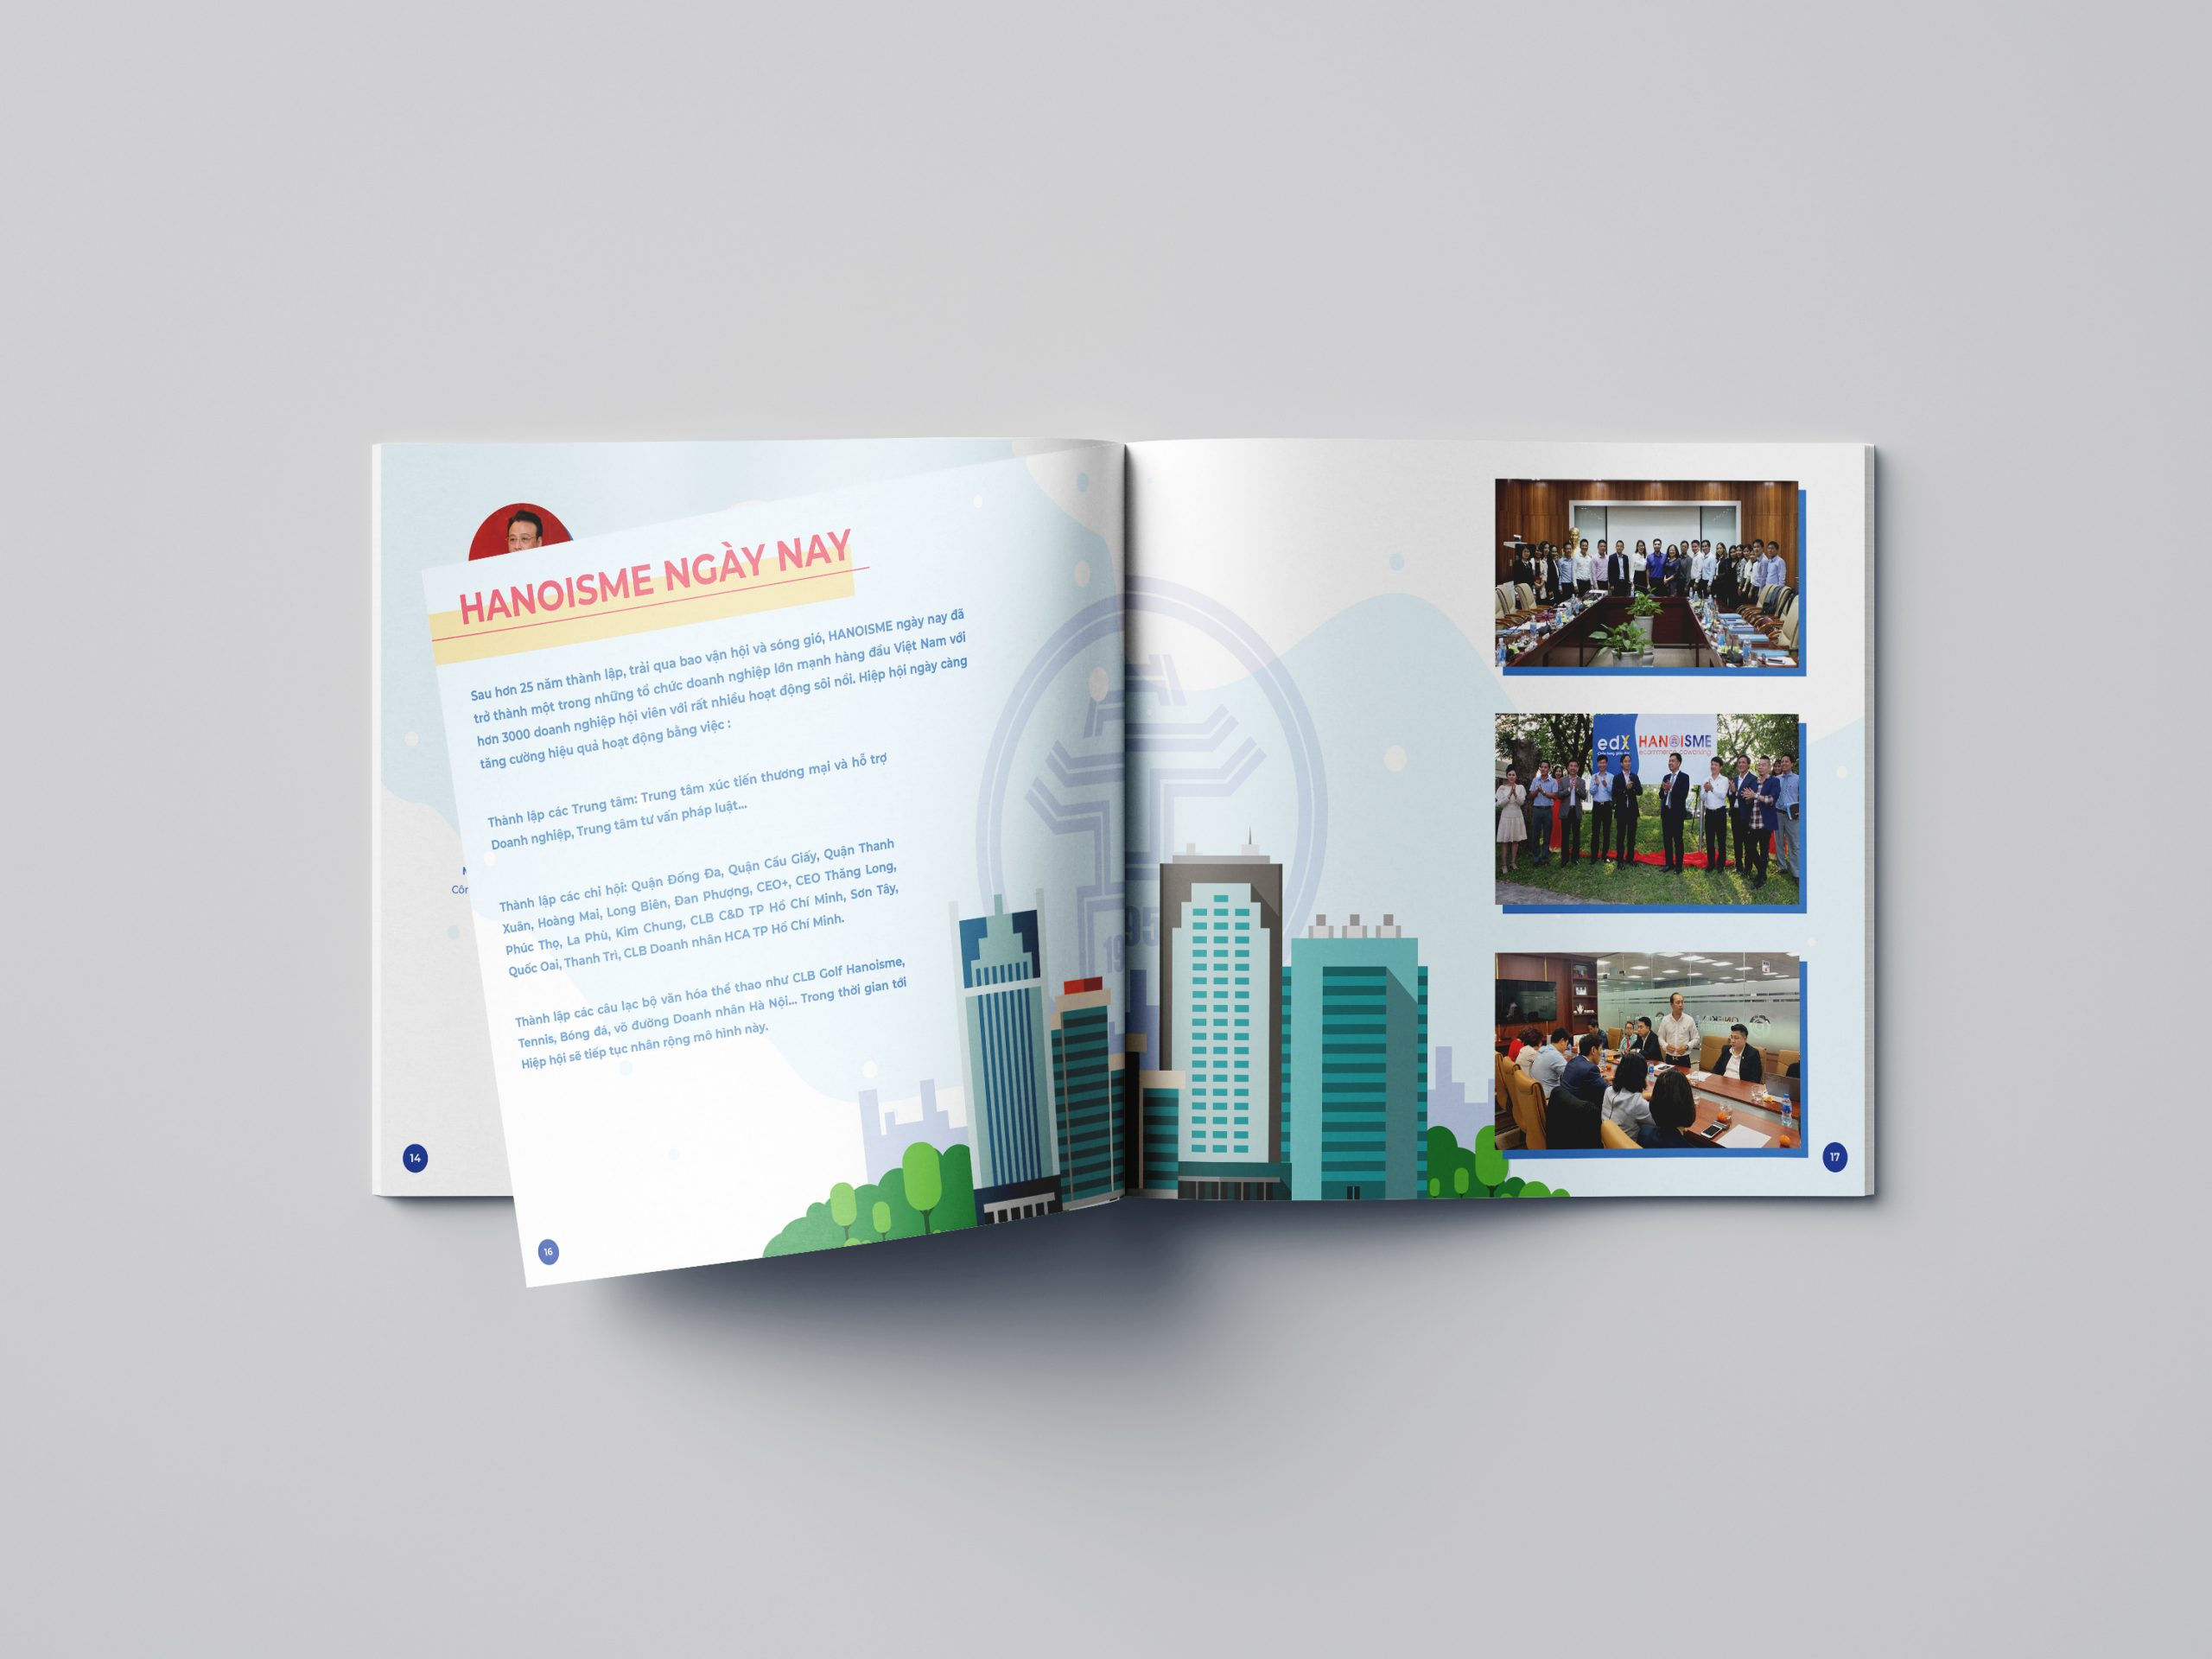 [Infographic] Hanoi SME brochure